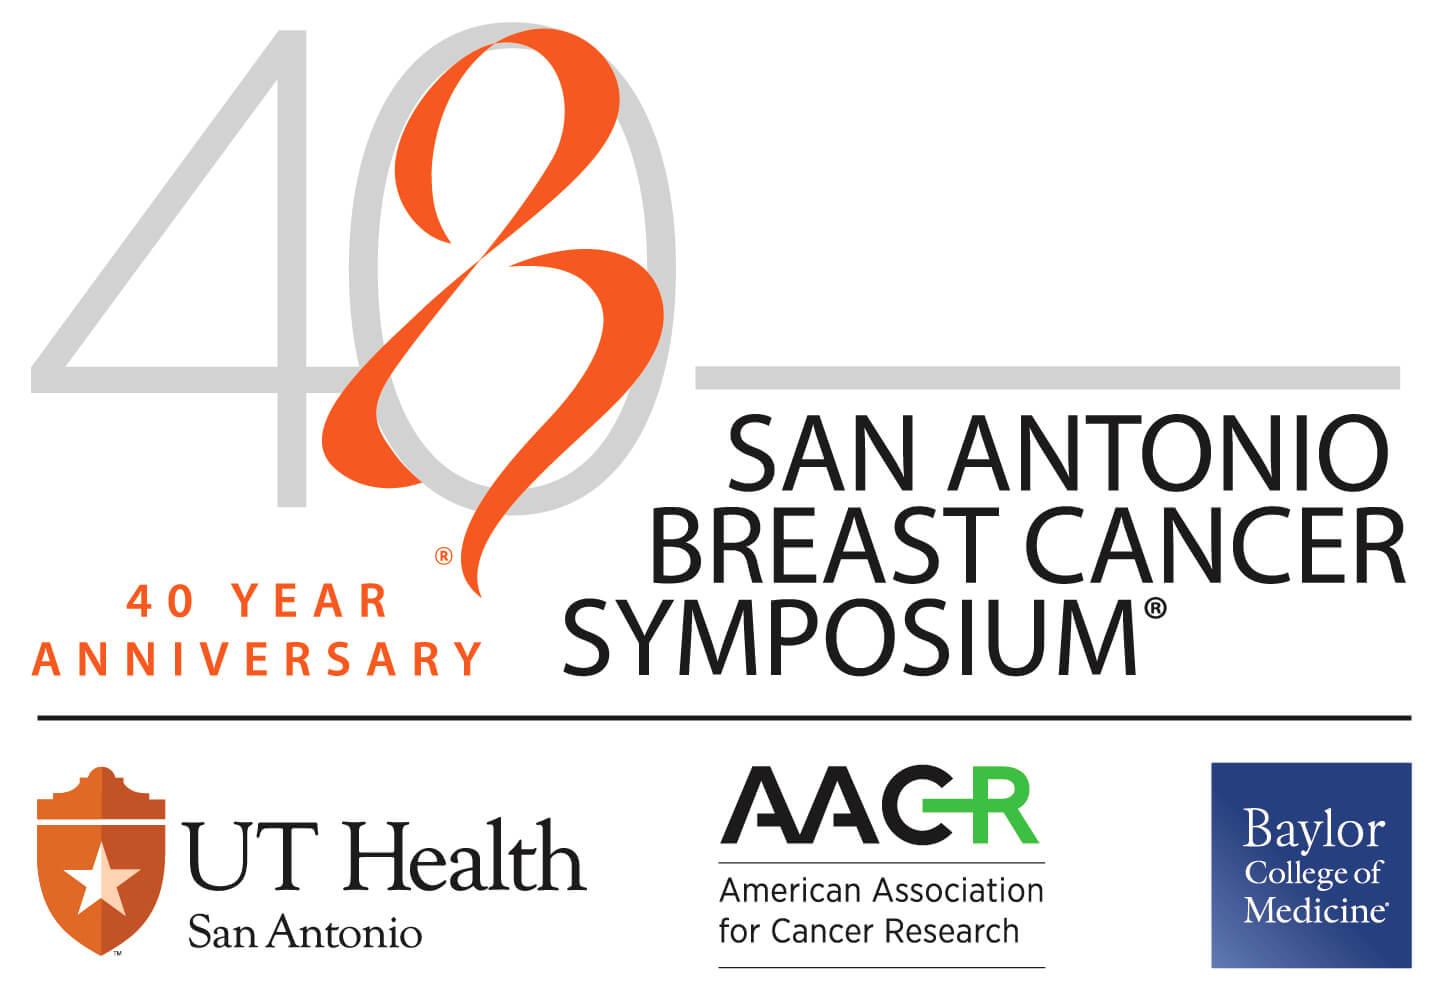 breast cancer symposium san antonio jpg 422x640